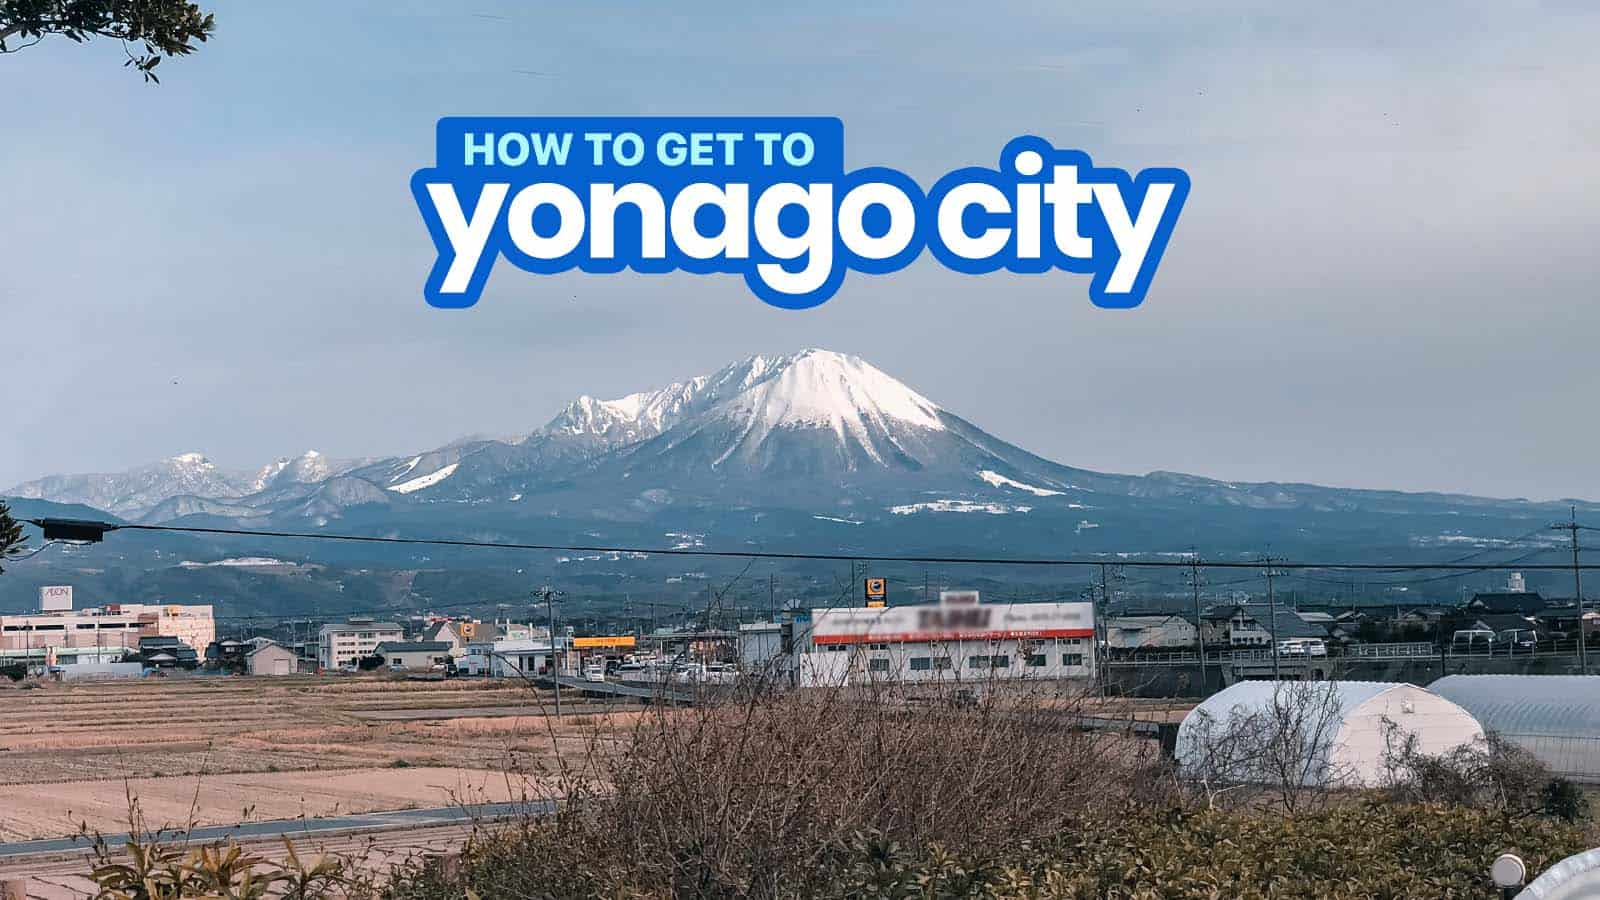 How to Get to YONAGO CITY from OSAKA, FUKUOKA and HIROSHIMA by BUS